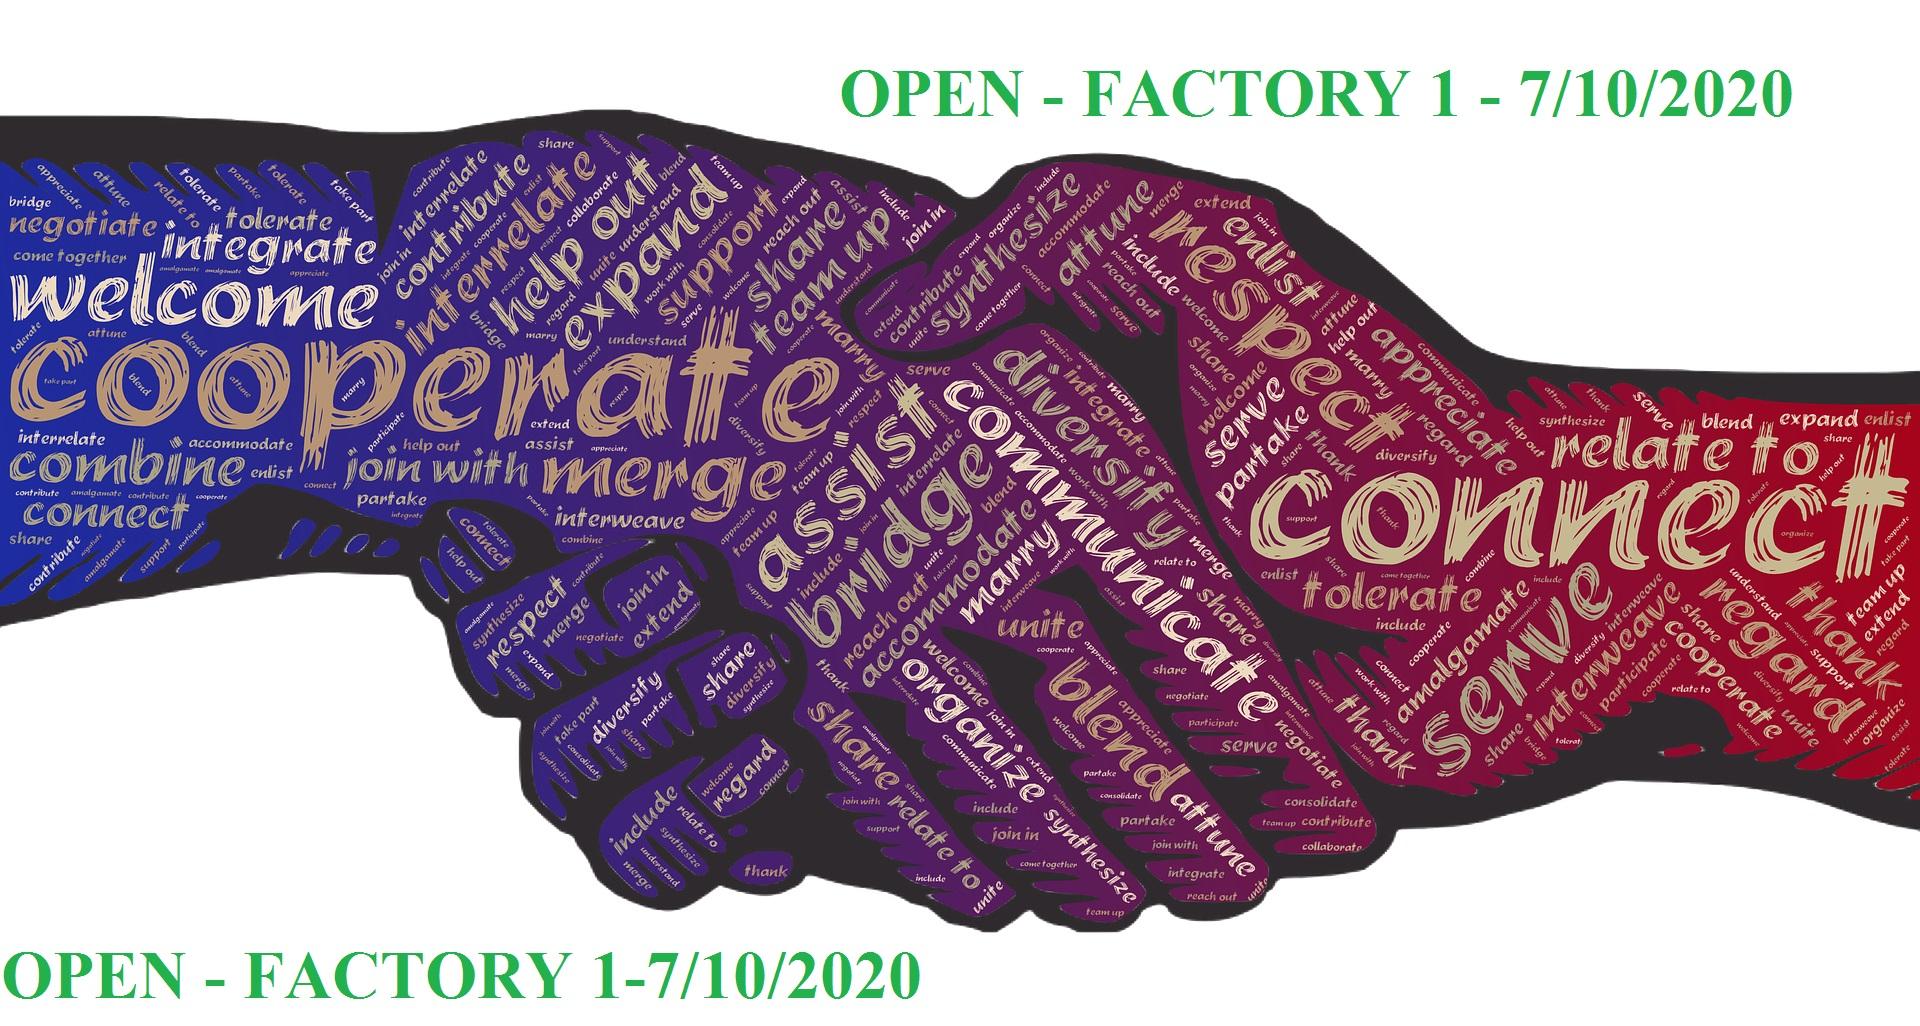 Open - Factory 1-7/10/2020